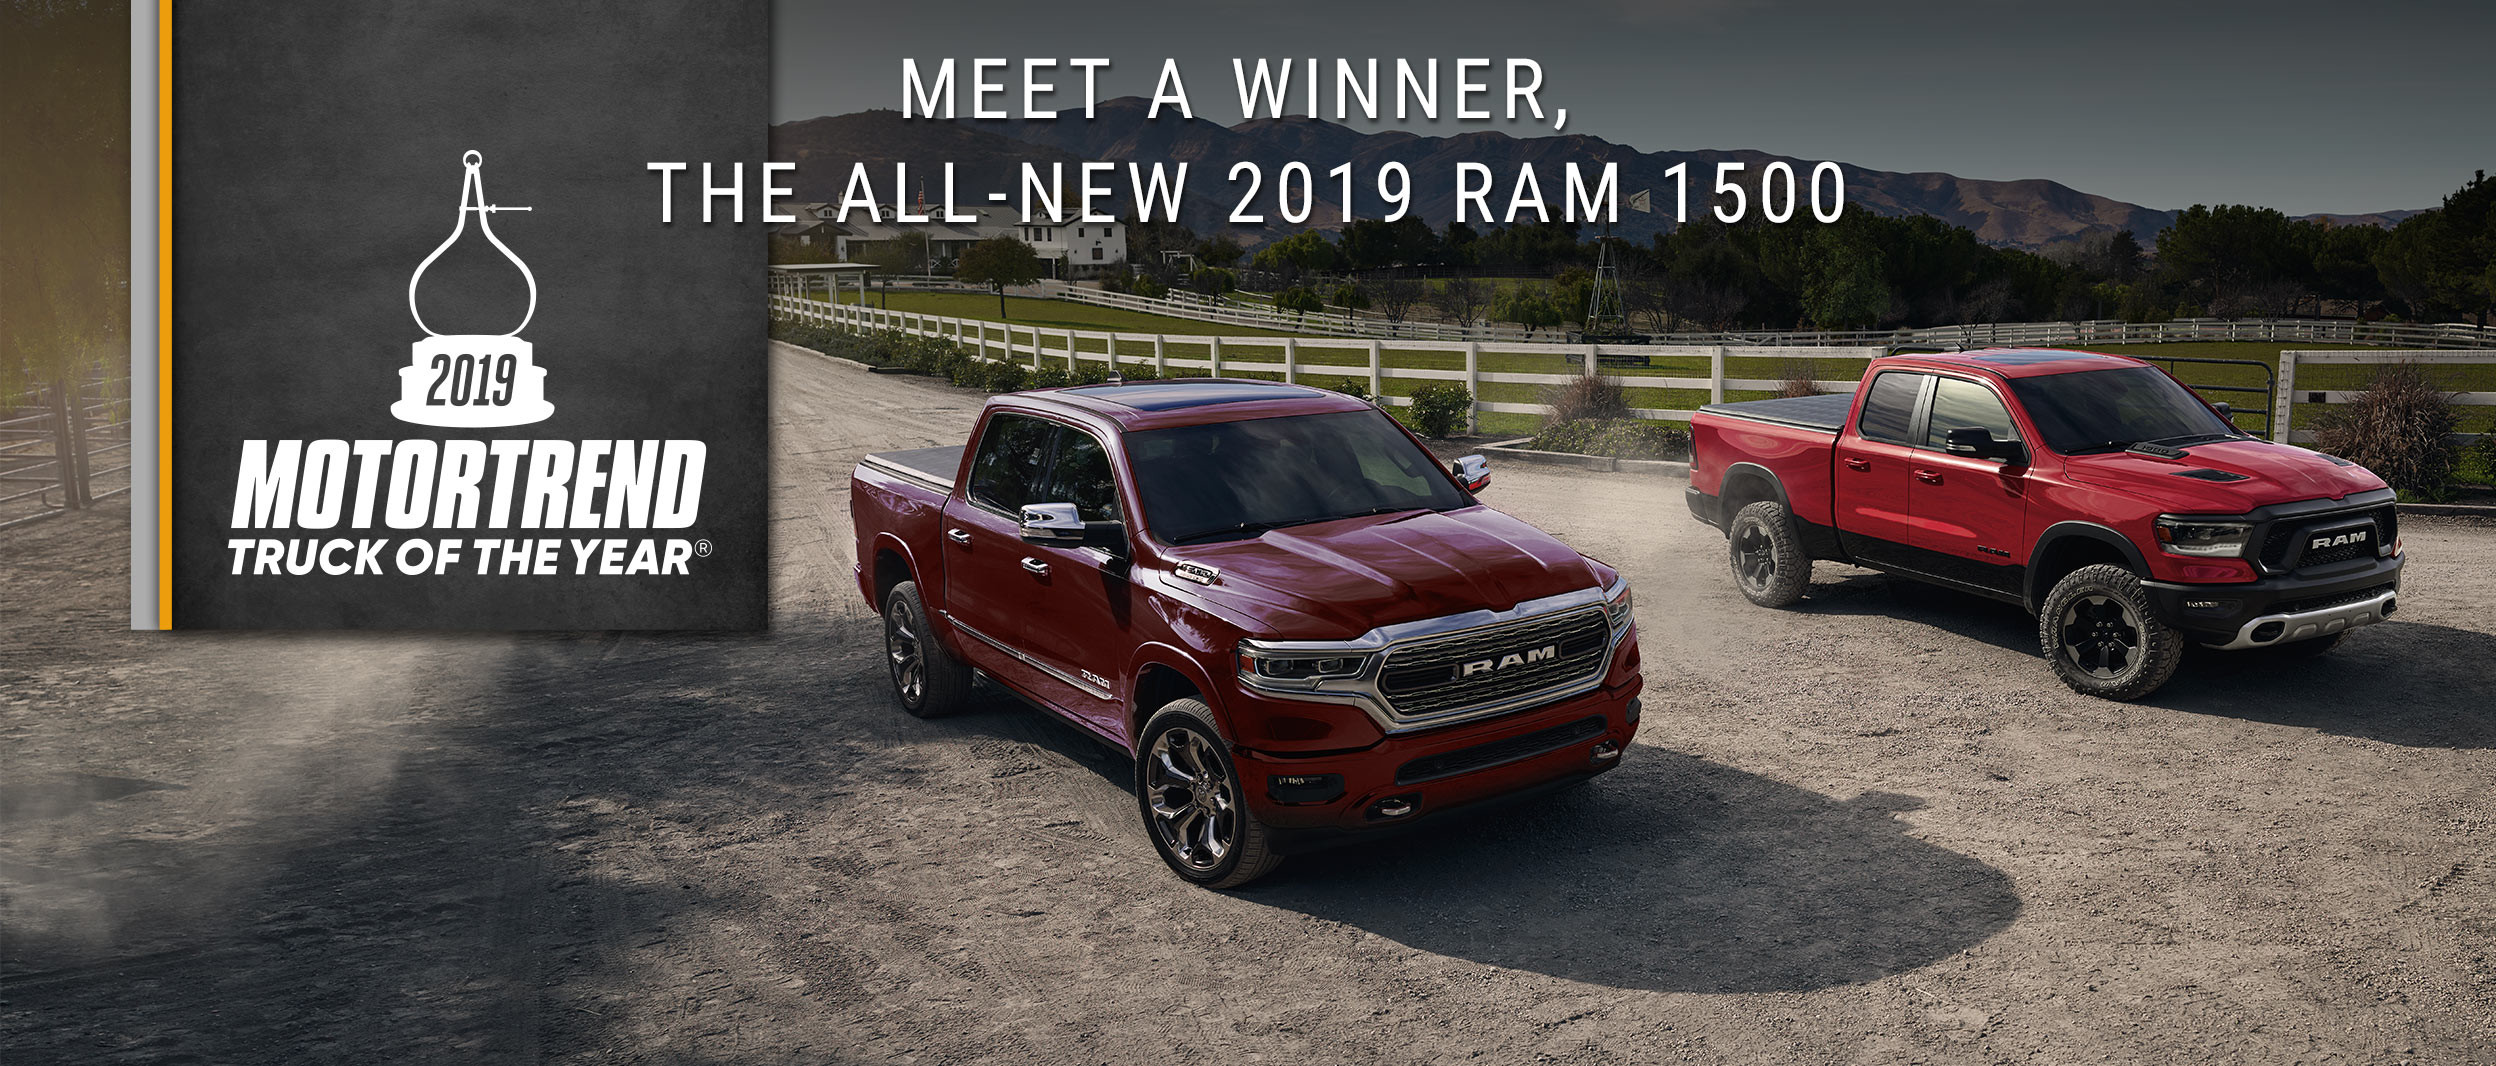 Ram Relax Basic Plus.All New 2019 Ram 1500 Truck Ram Trucks Canada